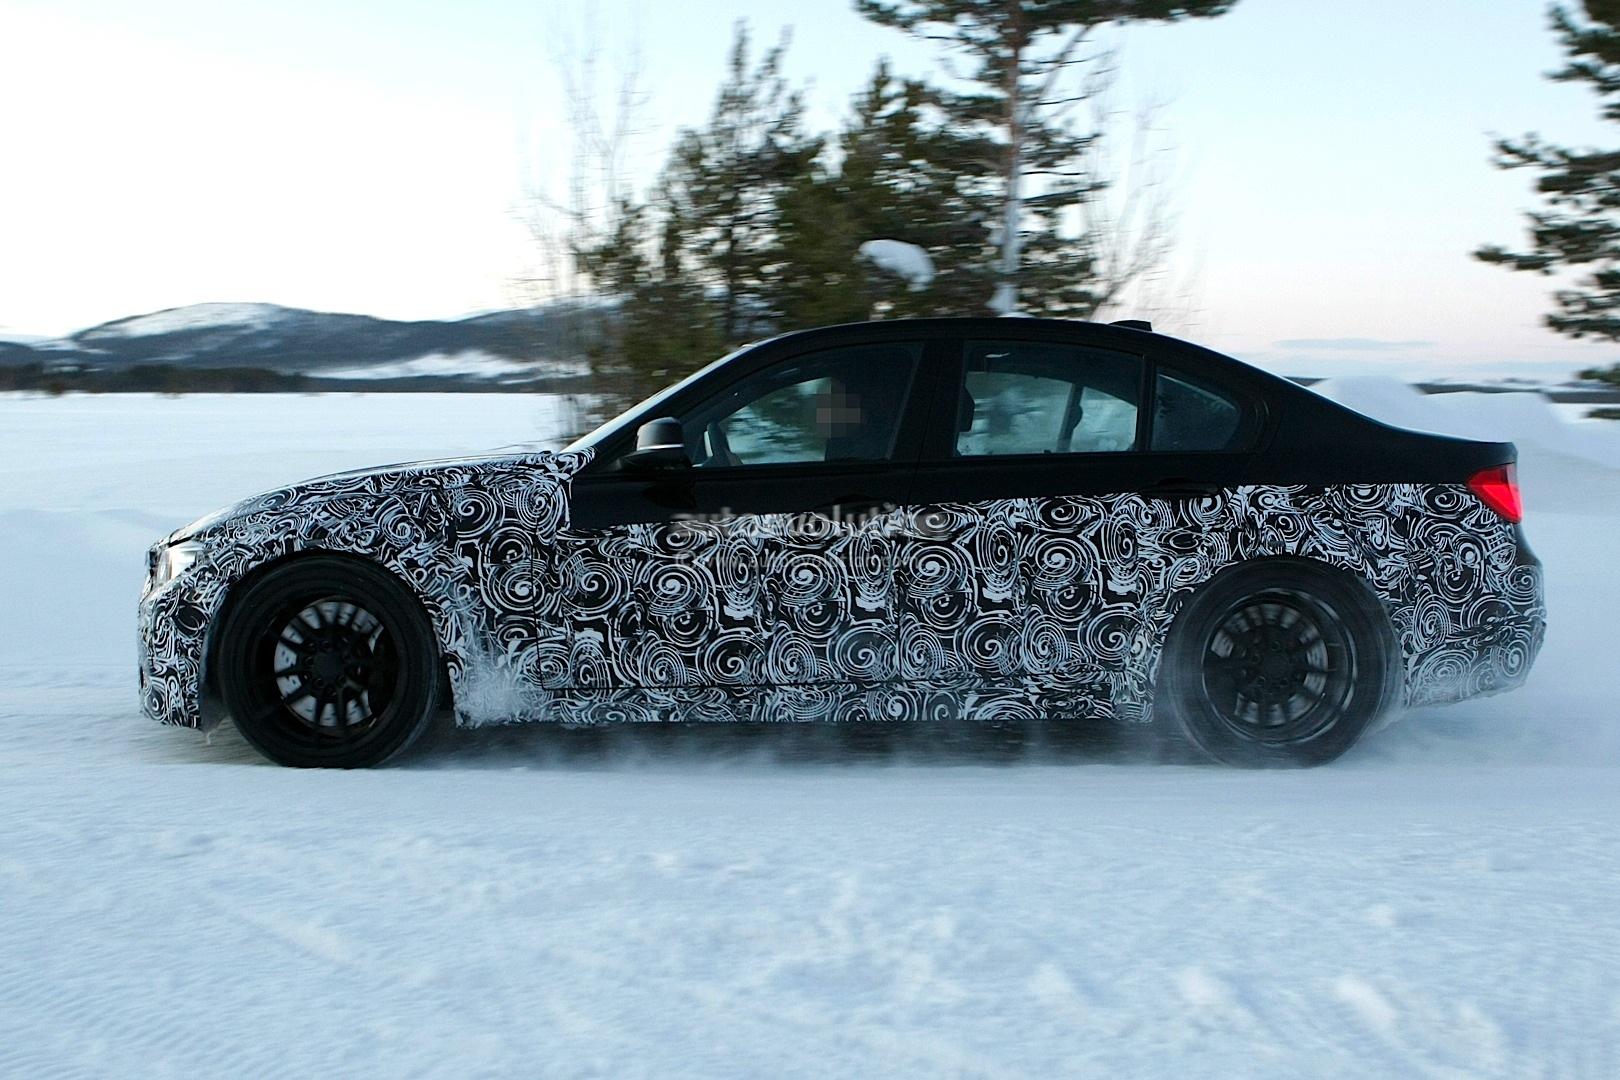 F30 BMW M3 Spyshot